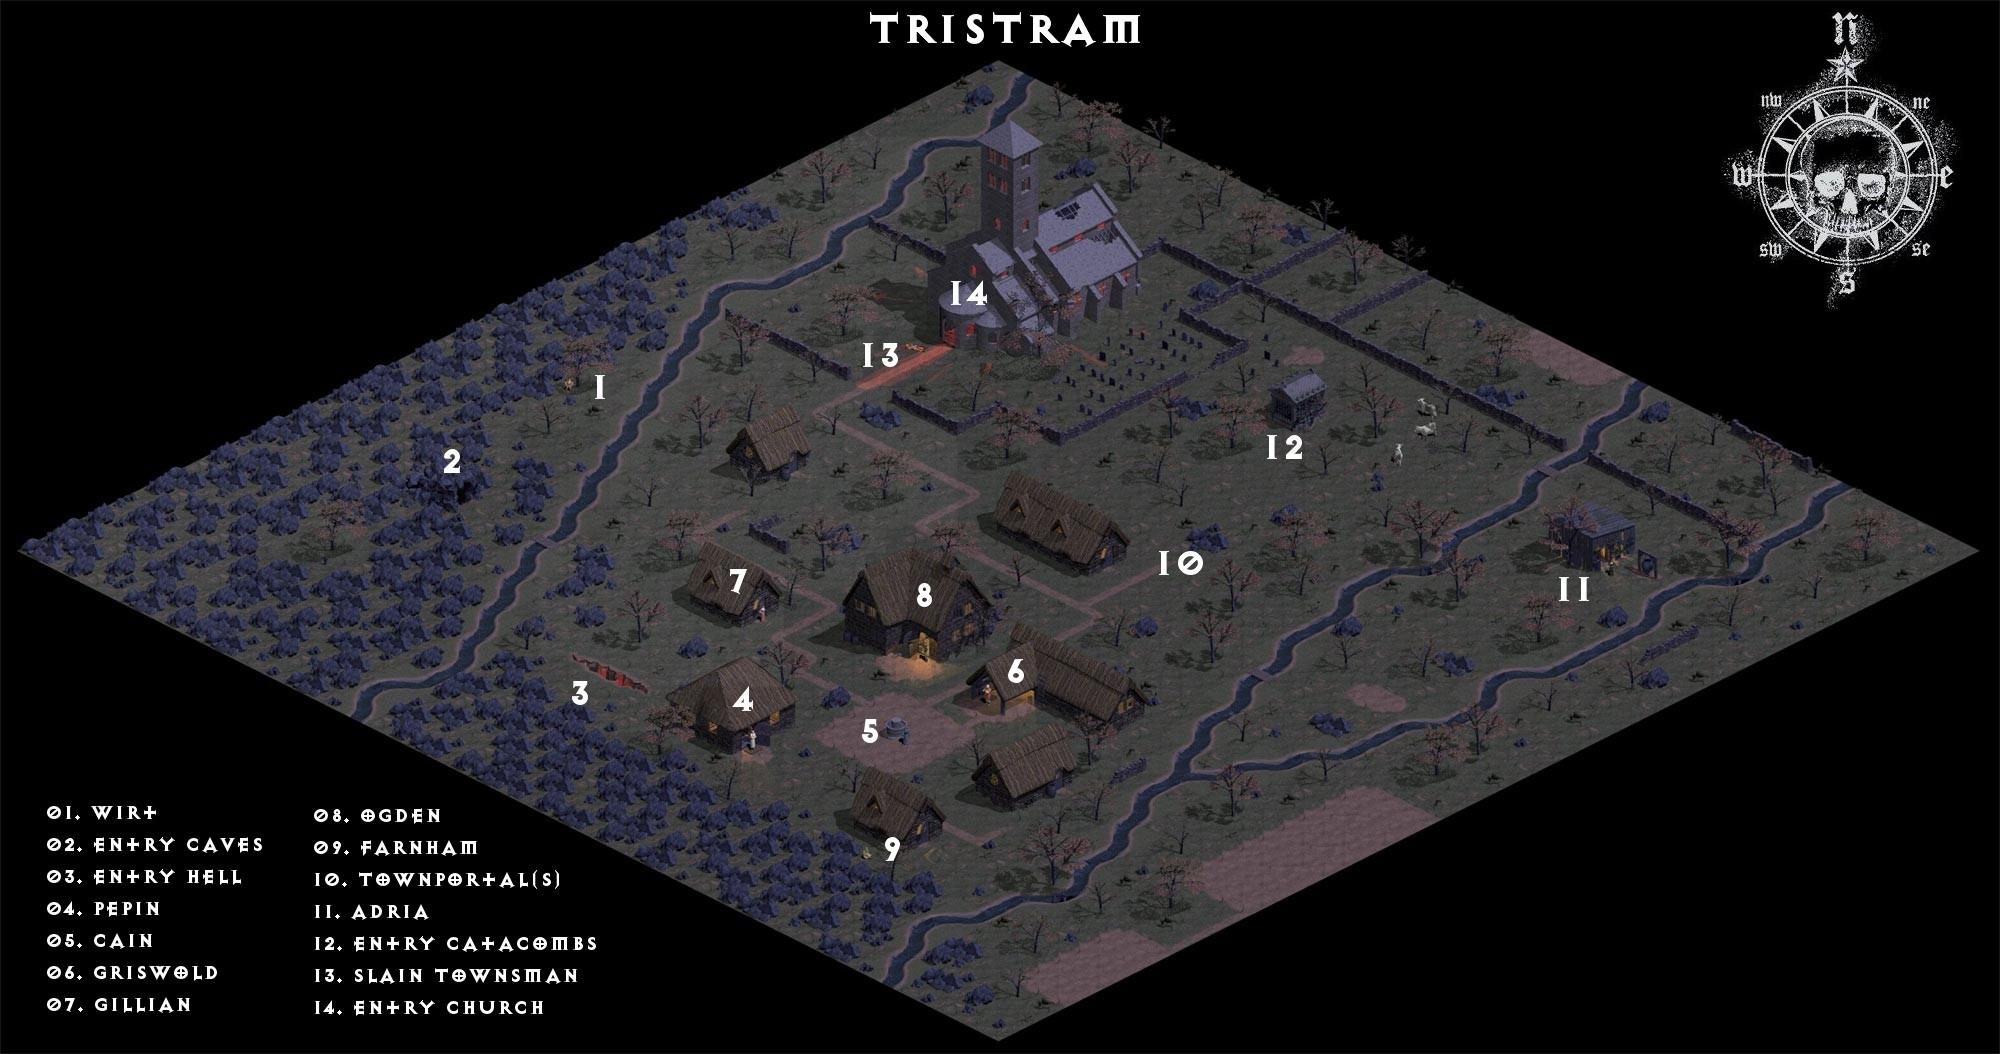 Diablo Wallpaper Hd Tristram Map